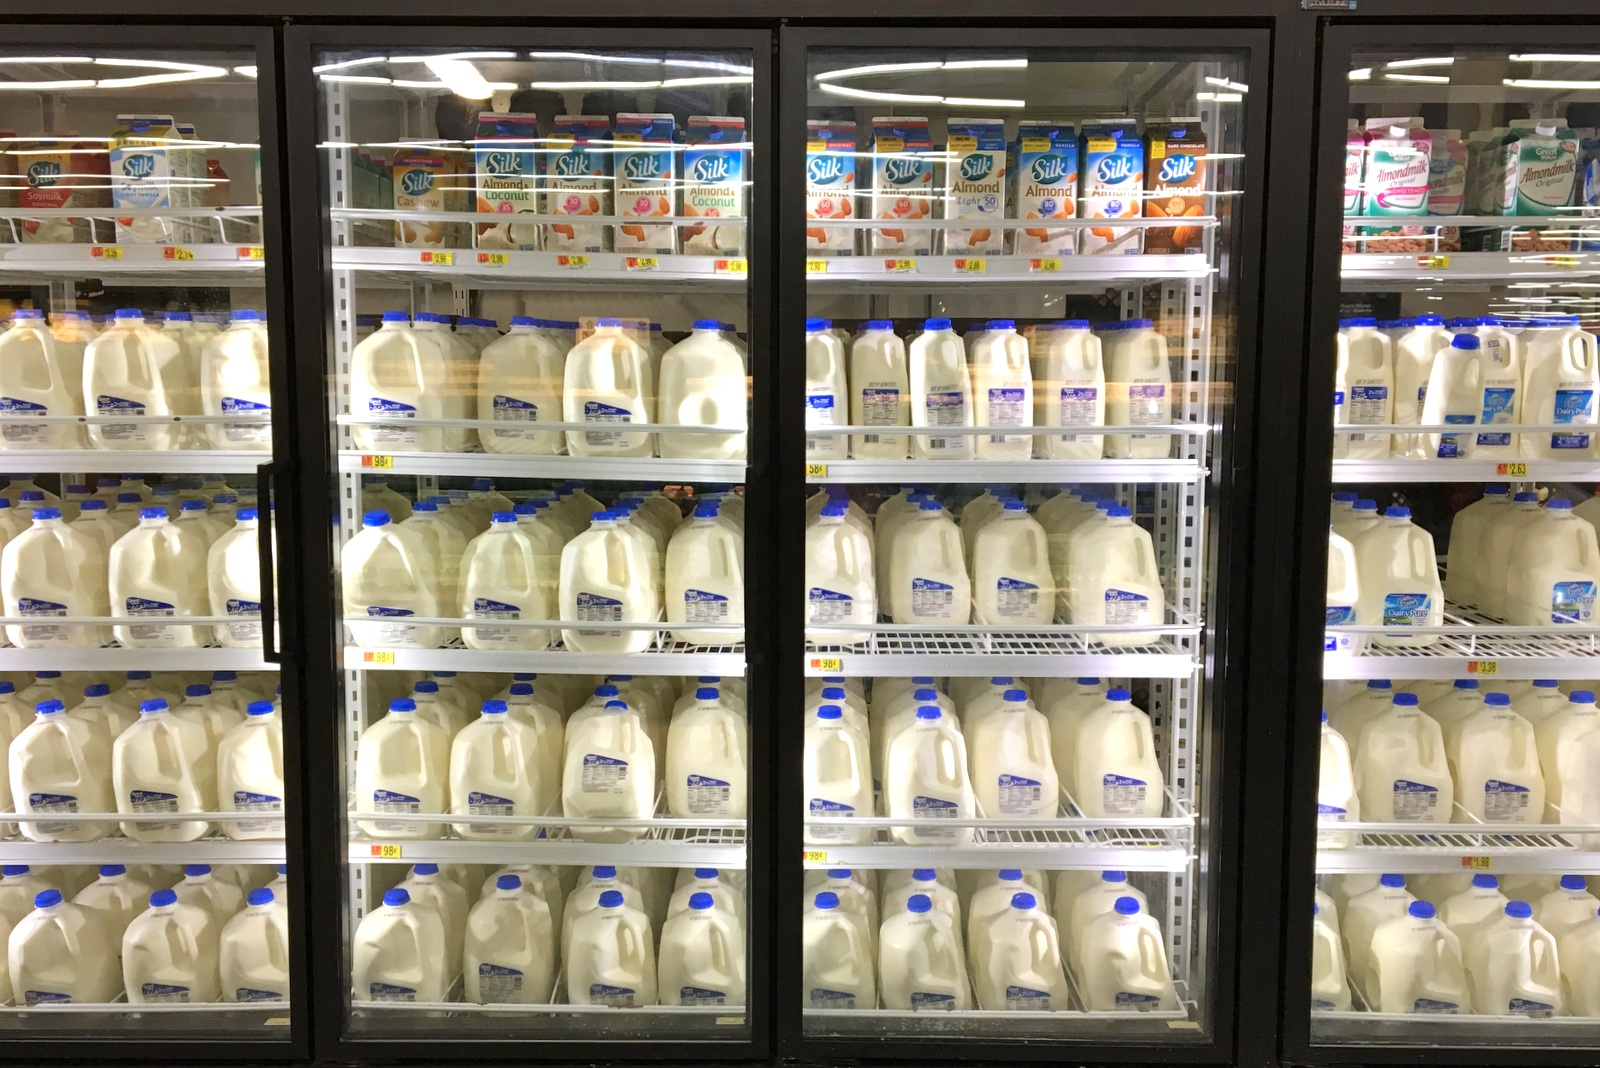 Silk Almondmilk at Walmart #SameSilkySmoothTaste #shop